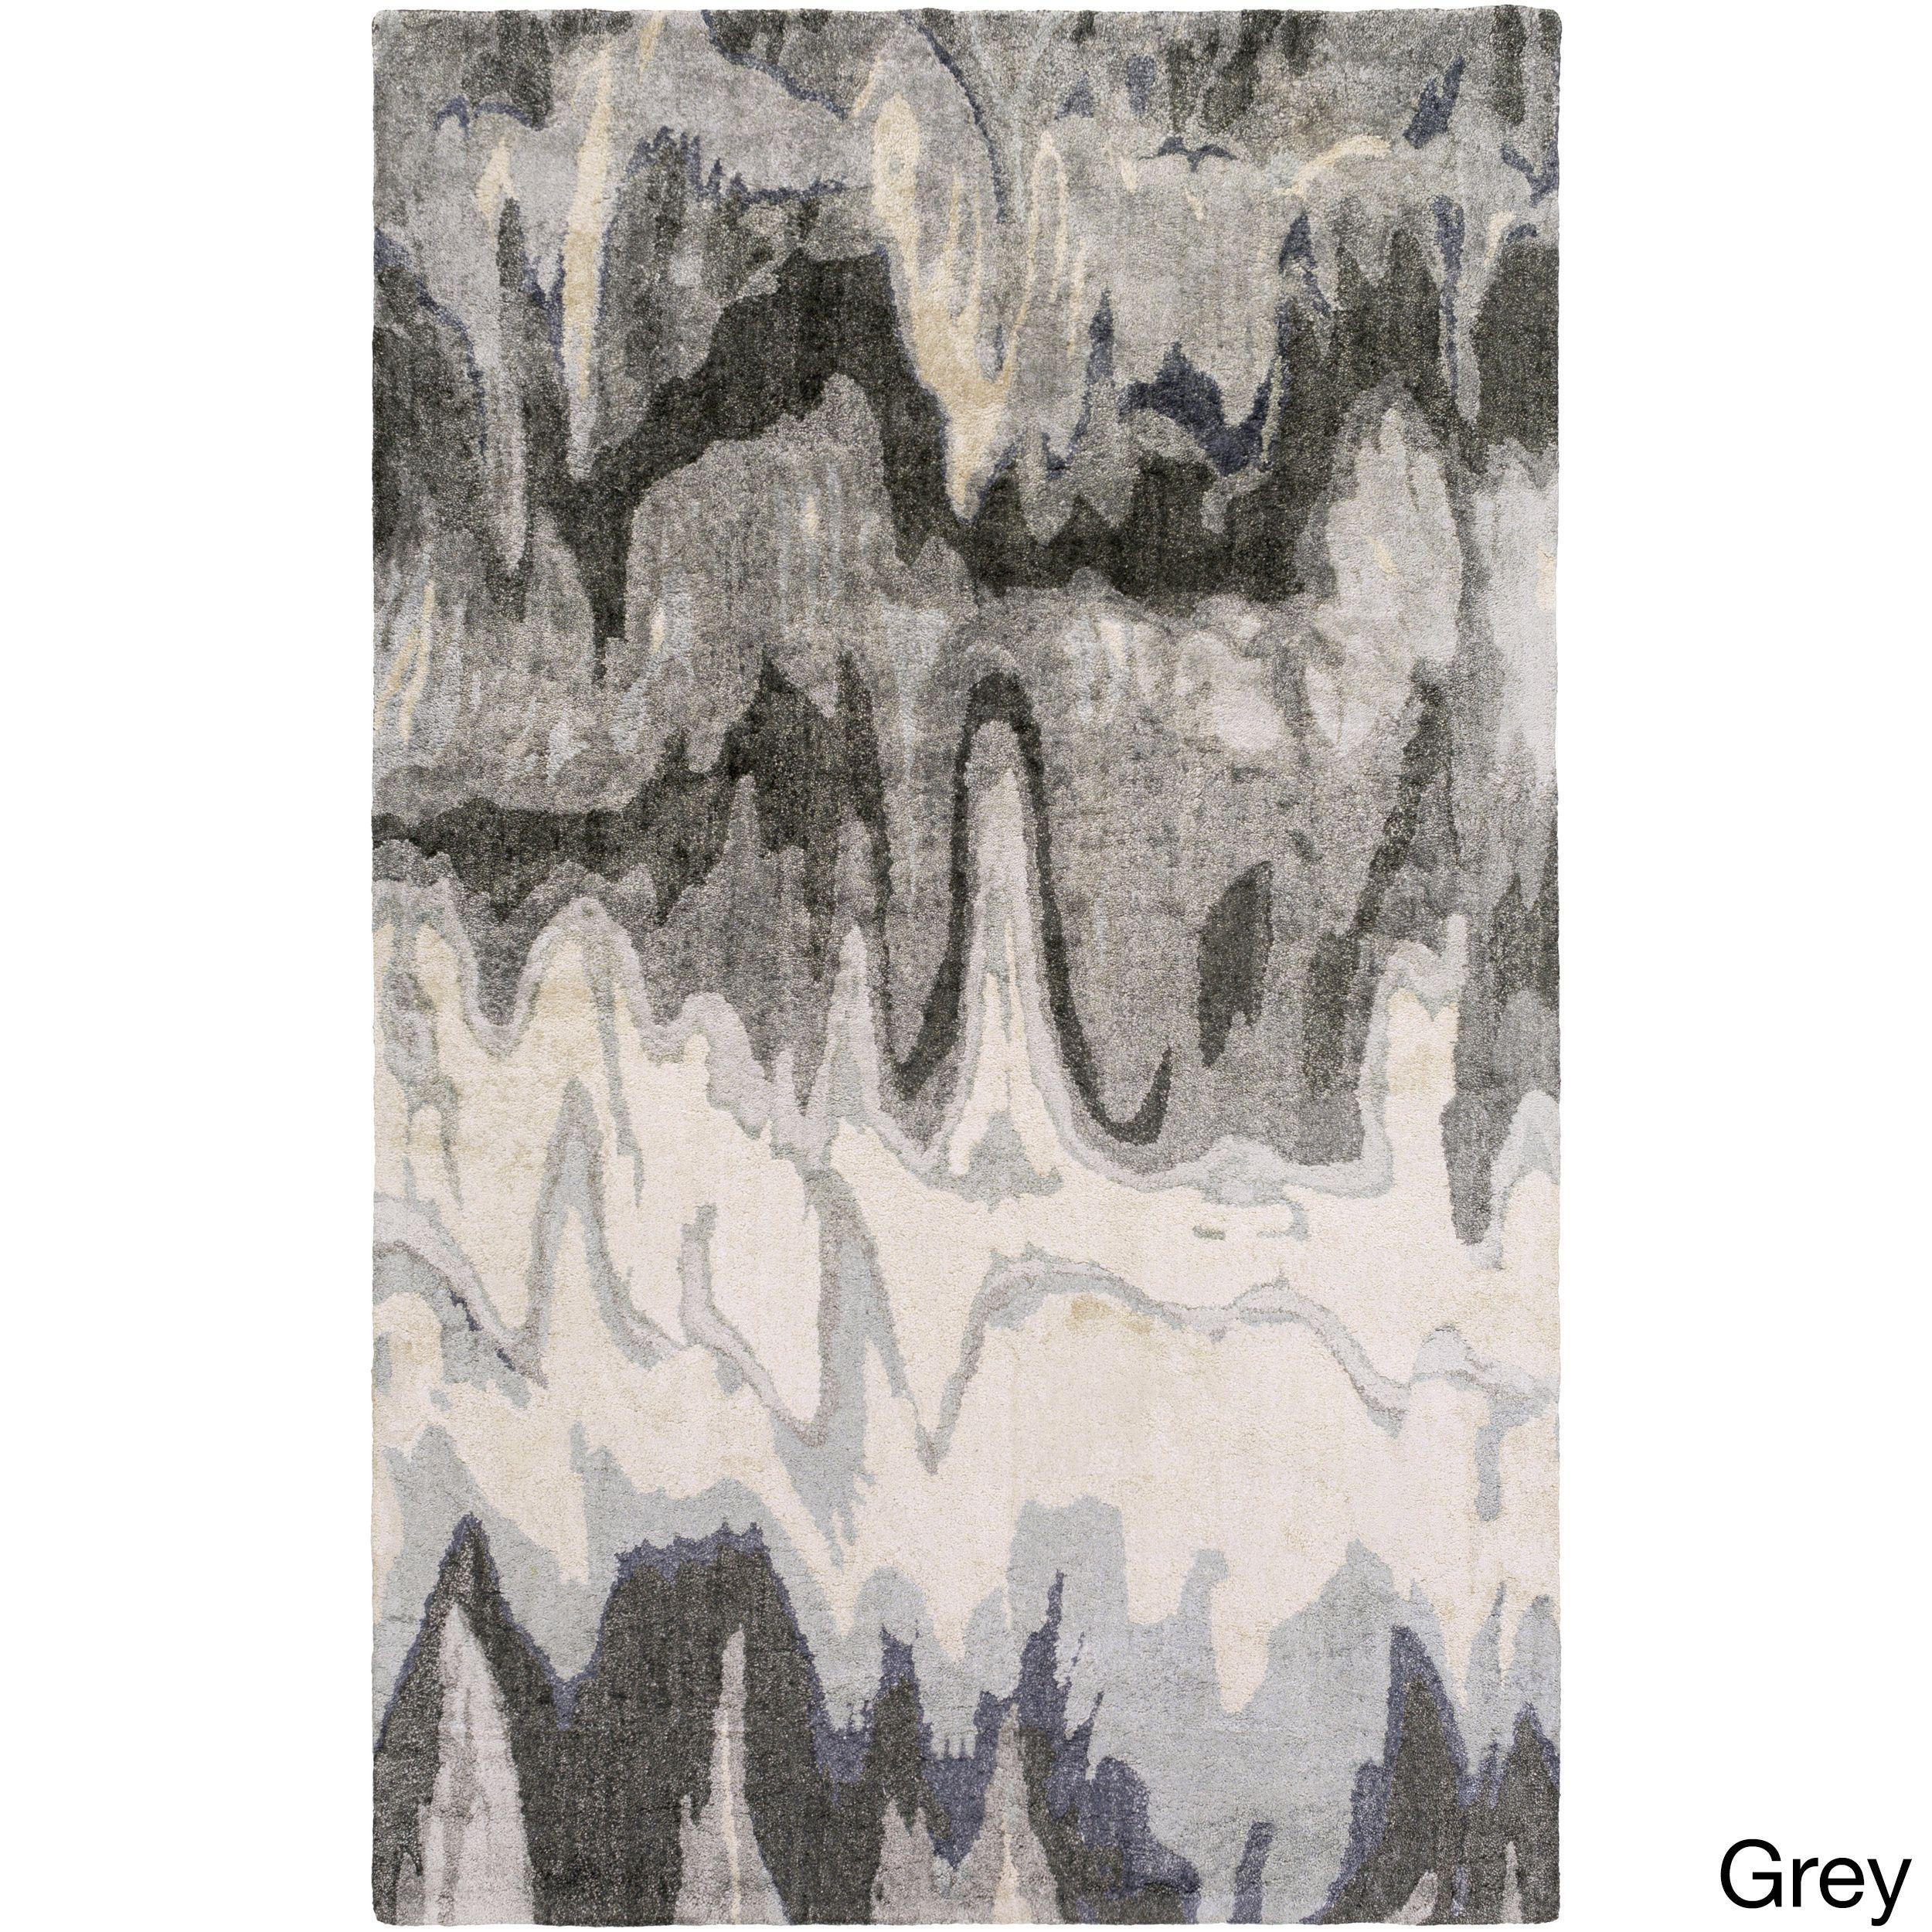 Hand-Tufted Abstract Banana Silk Rug (8' x 11') (Grey-(8' x 11')), Grey, Size 8' x 11'